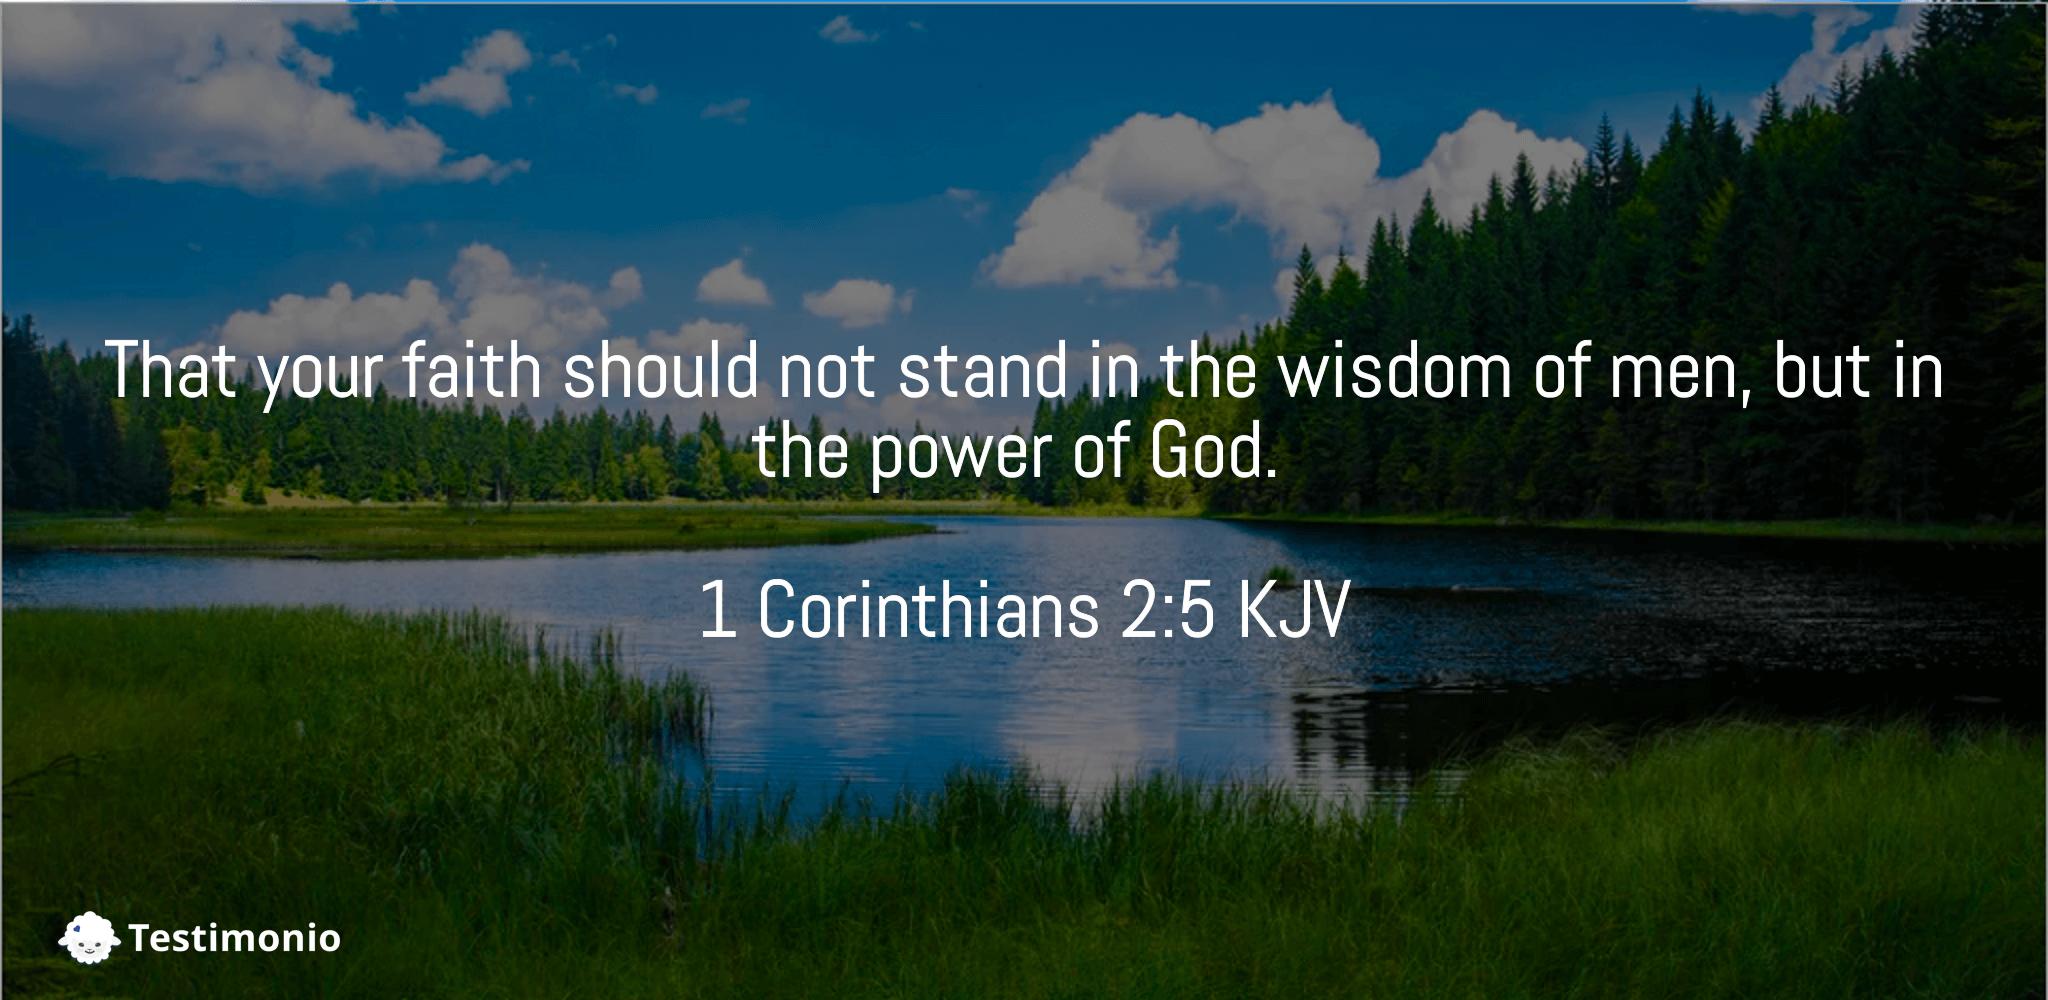 1 Corinthians 2:5